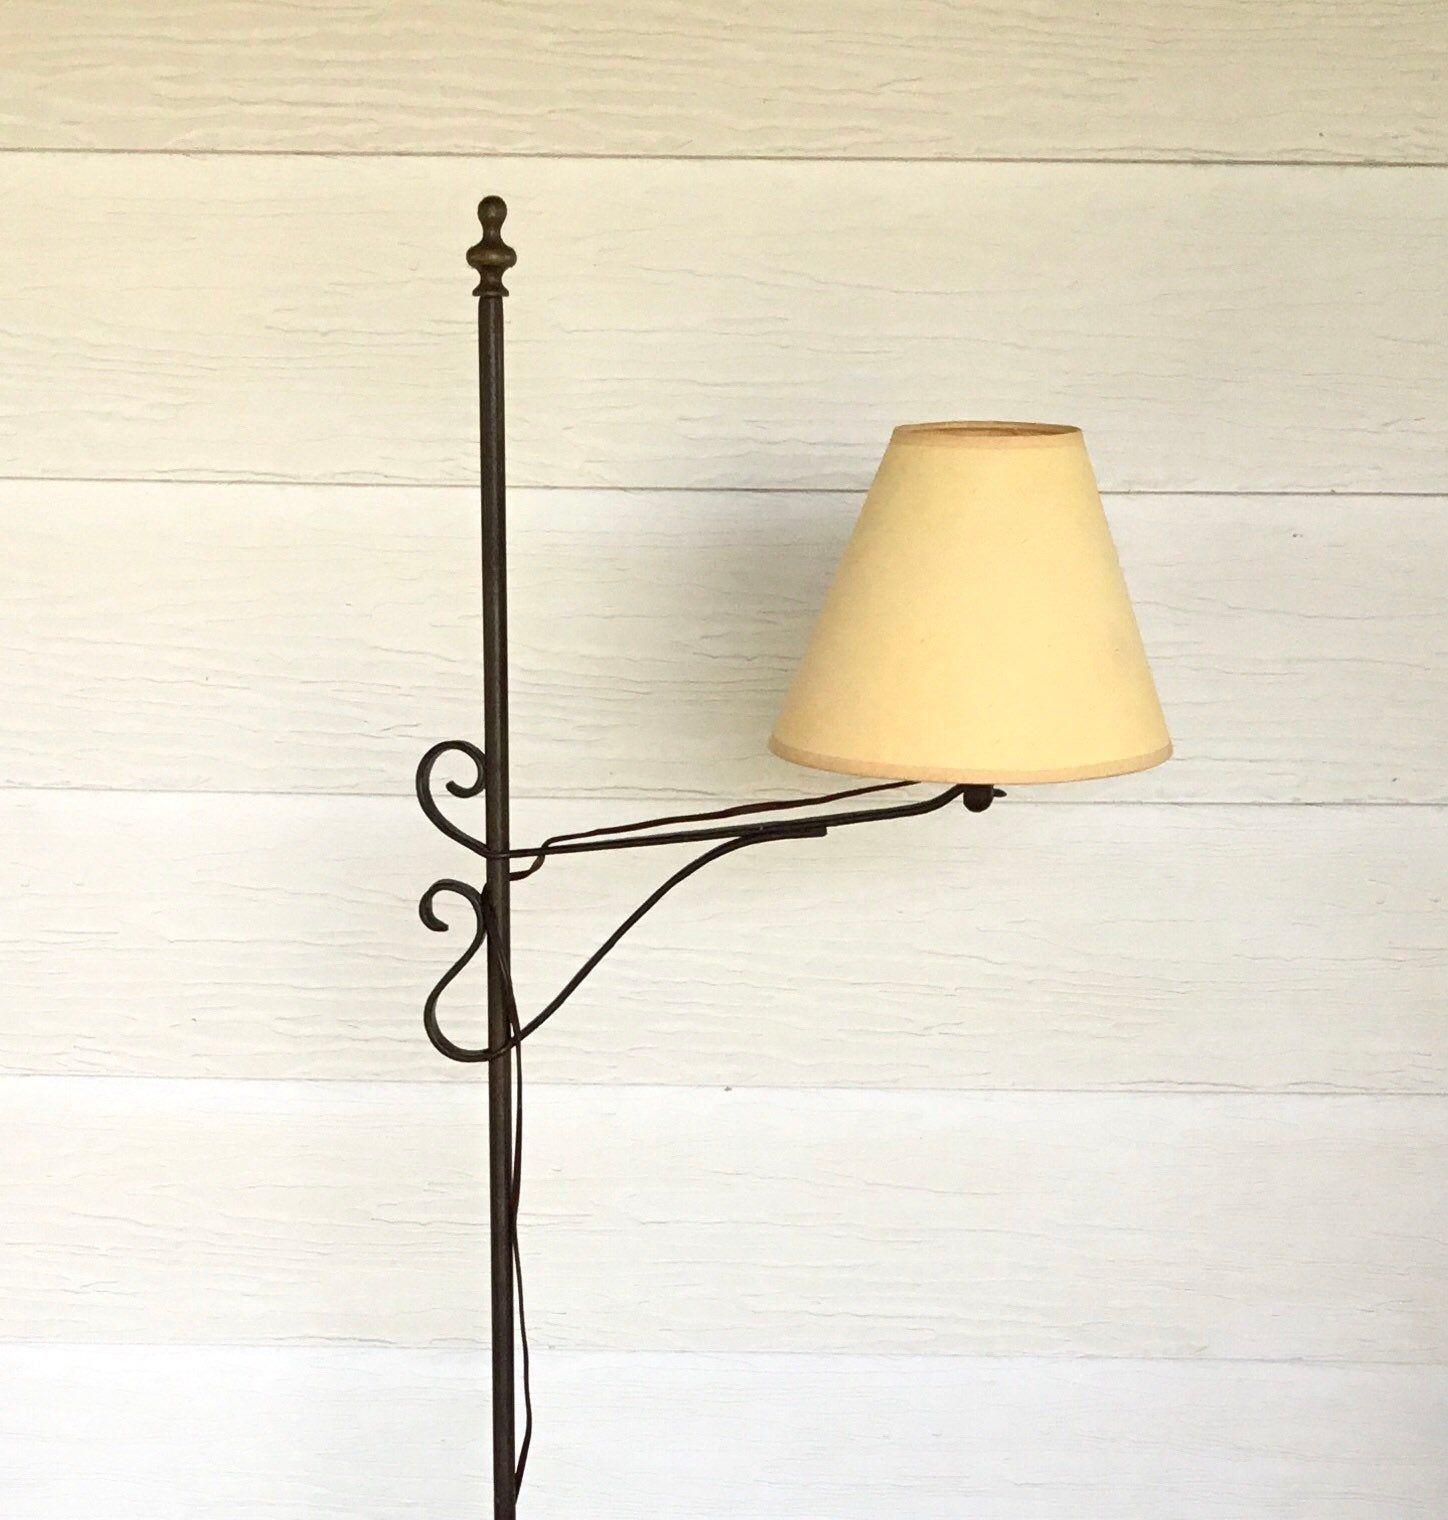 Floor Lamp Forged Iron Early American Black Wrought Iron Etsy Adjustable Lighting Lamp Floor Lamp